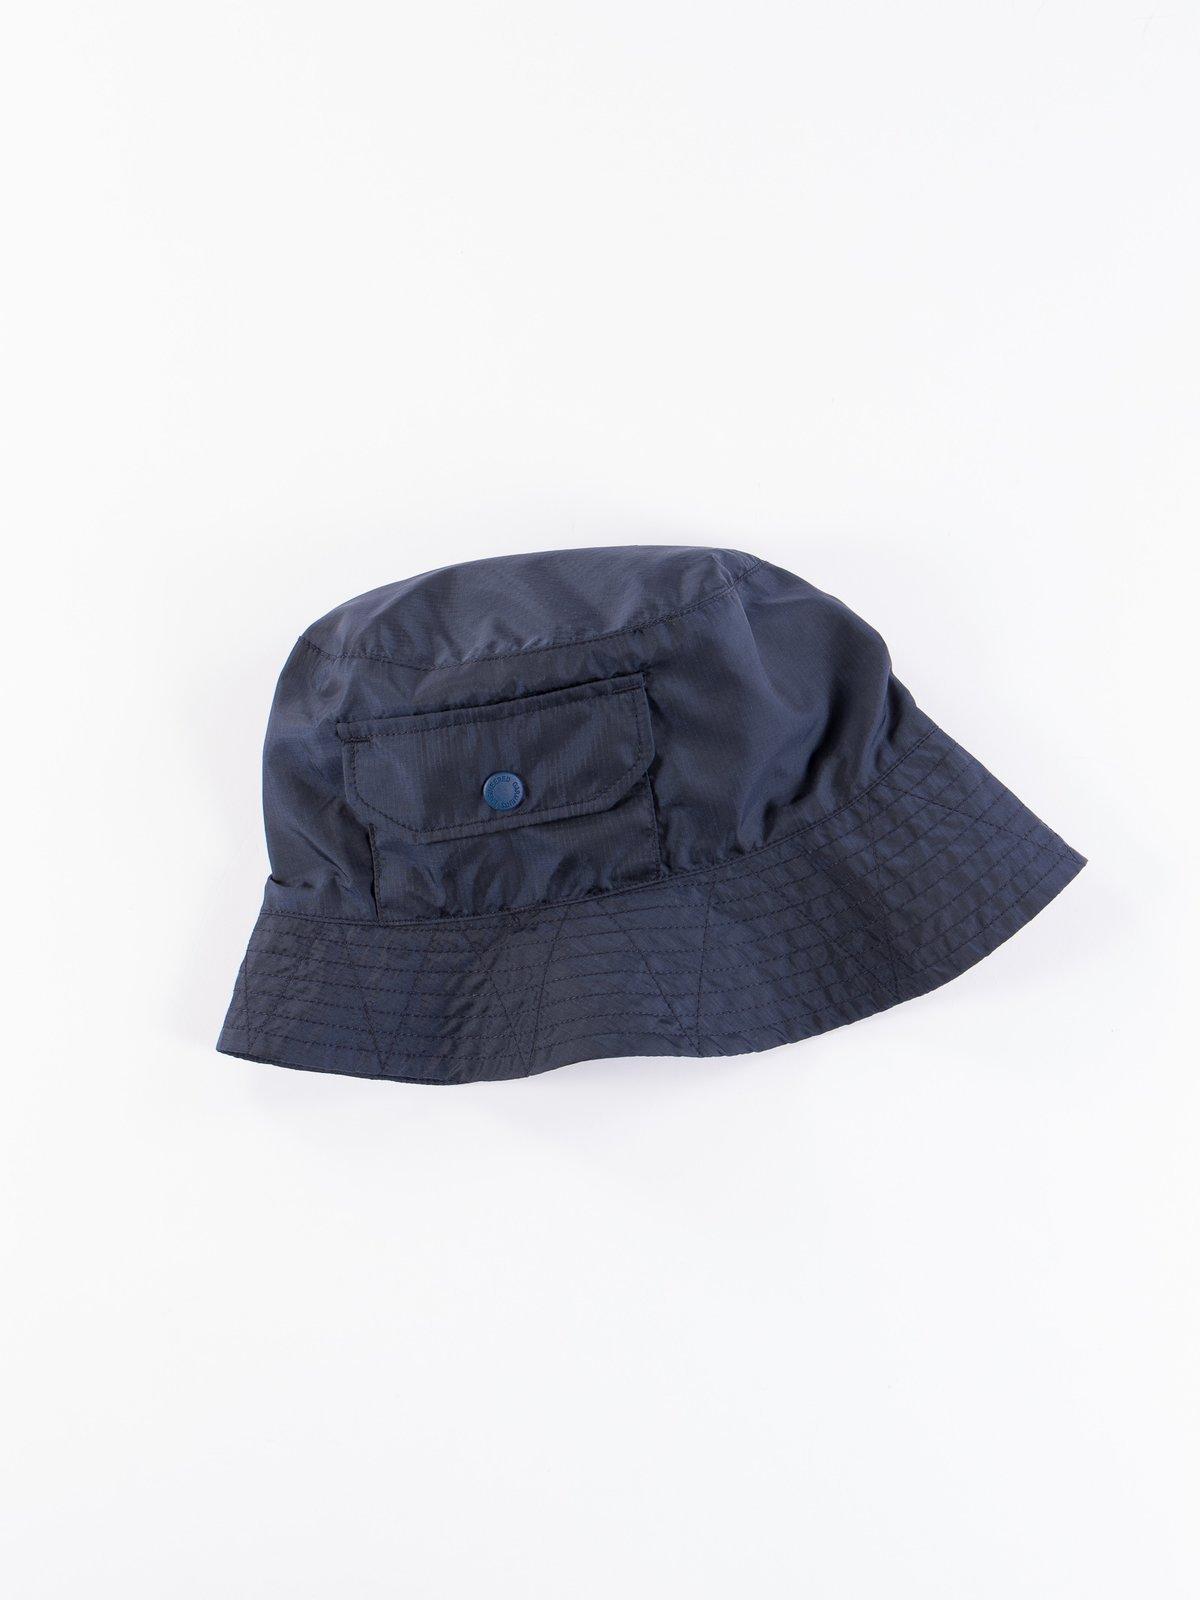 Navy Nylon Micro Ripstop Explorer Hat - Image 2